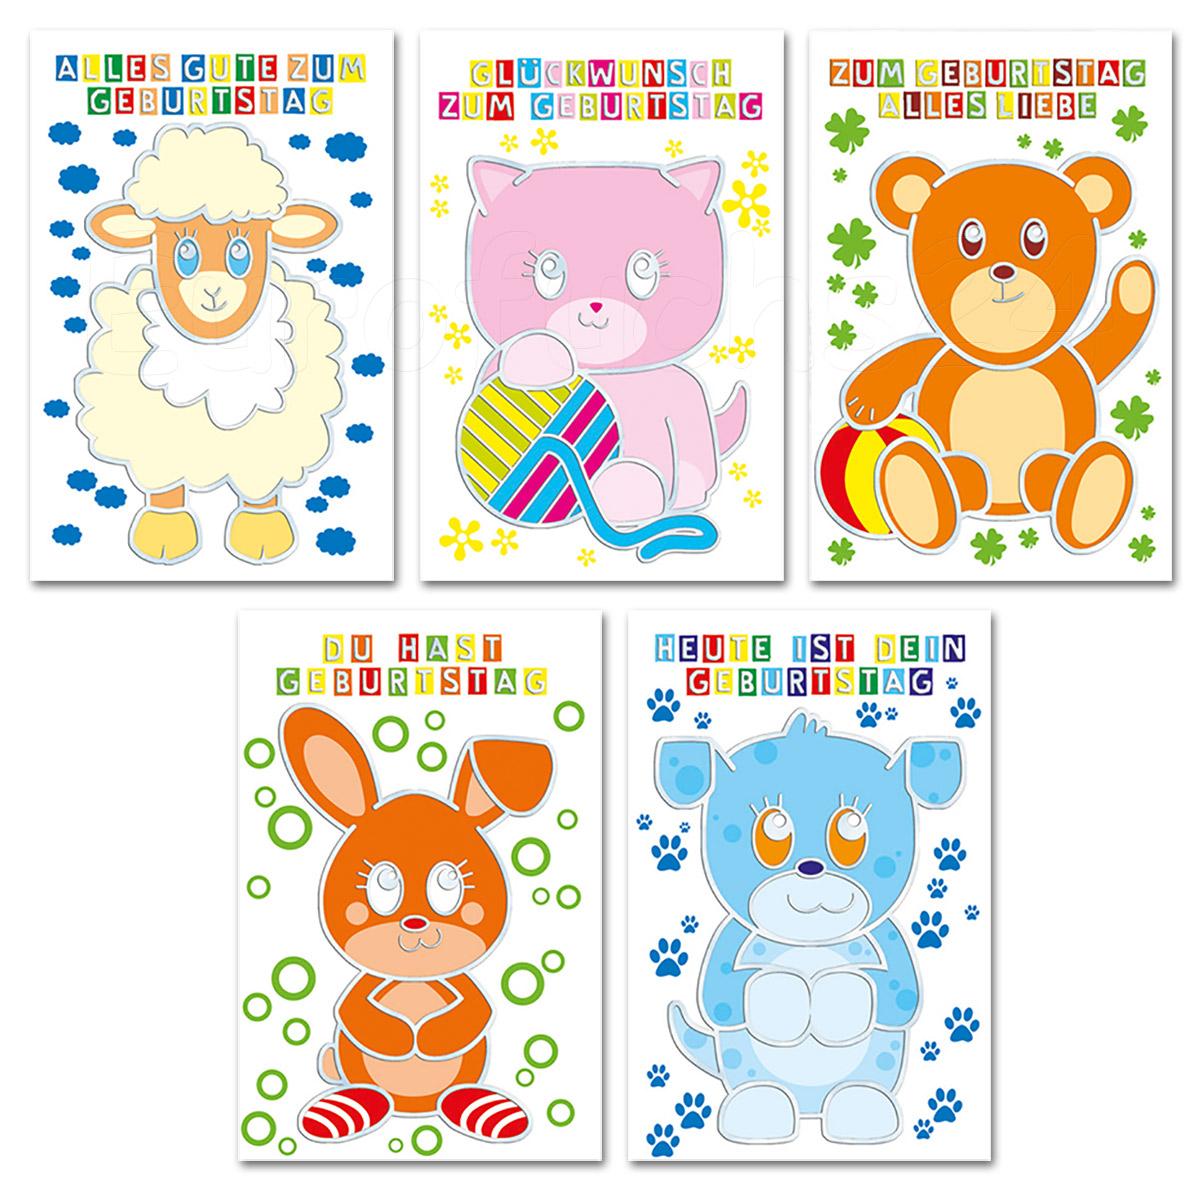 Geburtstagskarten Premium Glückwunschkarten Kinder-Geburtstag Grußkarten  4444 (25 Stück) bei Geburtstagskarten Kinder